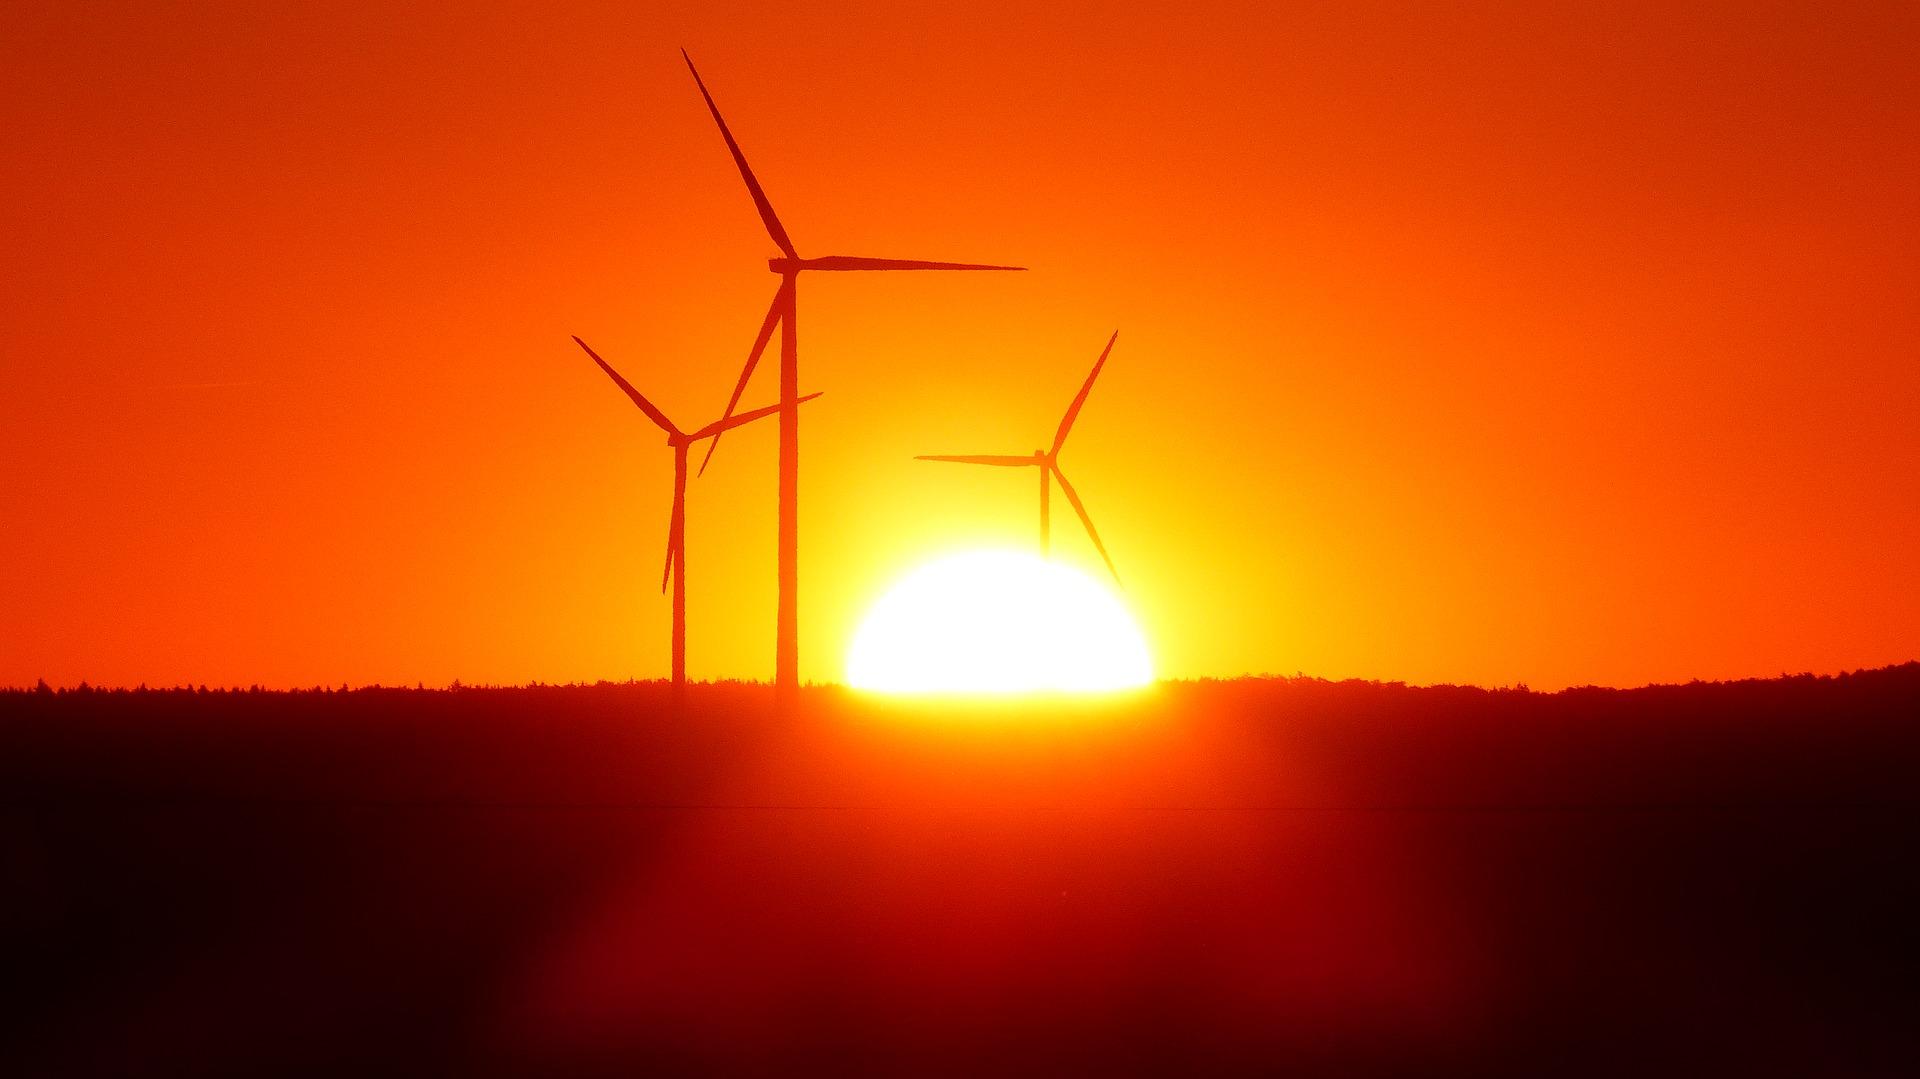 wind-power-plant-energy-efficient